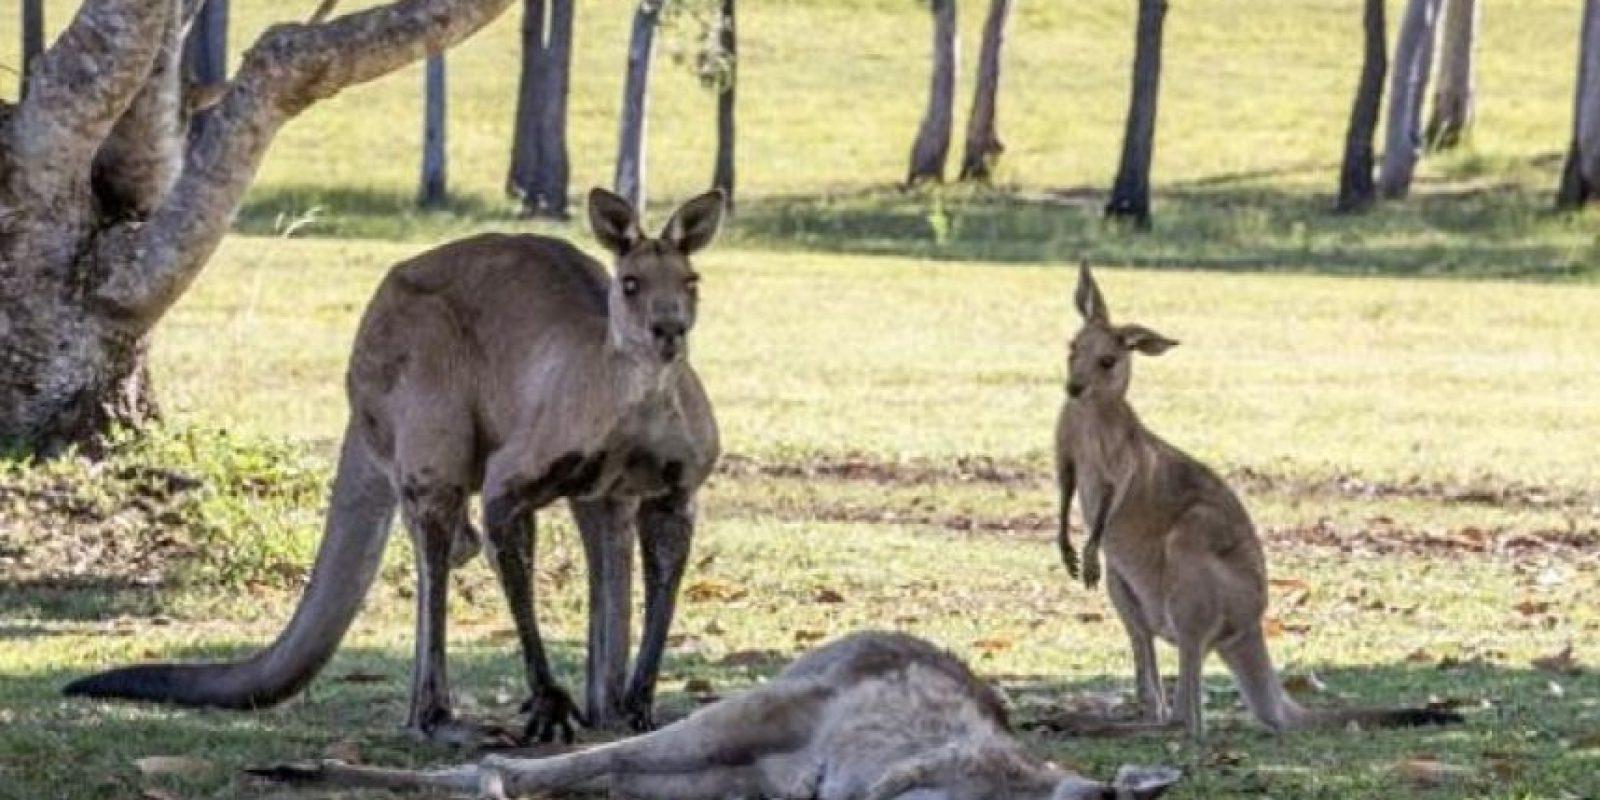 Esta escena se hizo viral. Pasó en Queensland, Australia. Foto:vía Ewan Switzer